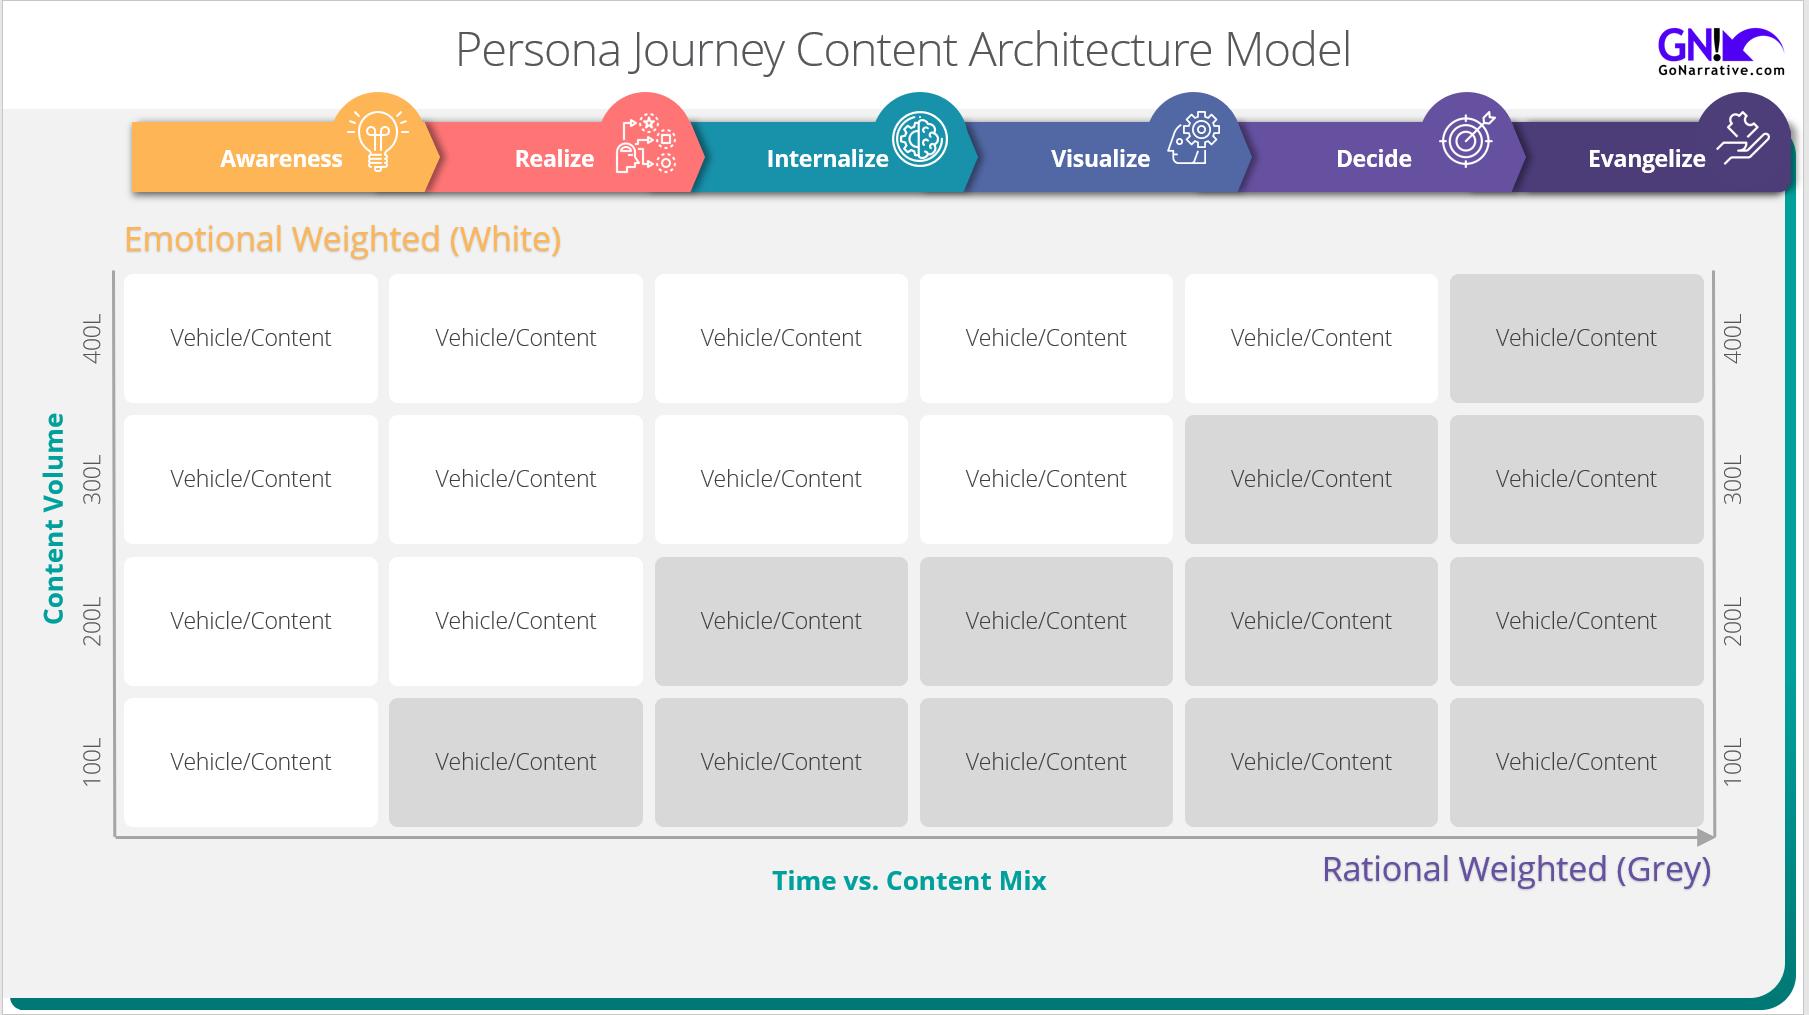 Matthew Woodget Go Narrative Content Architecture Model Marketing general.png